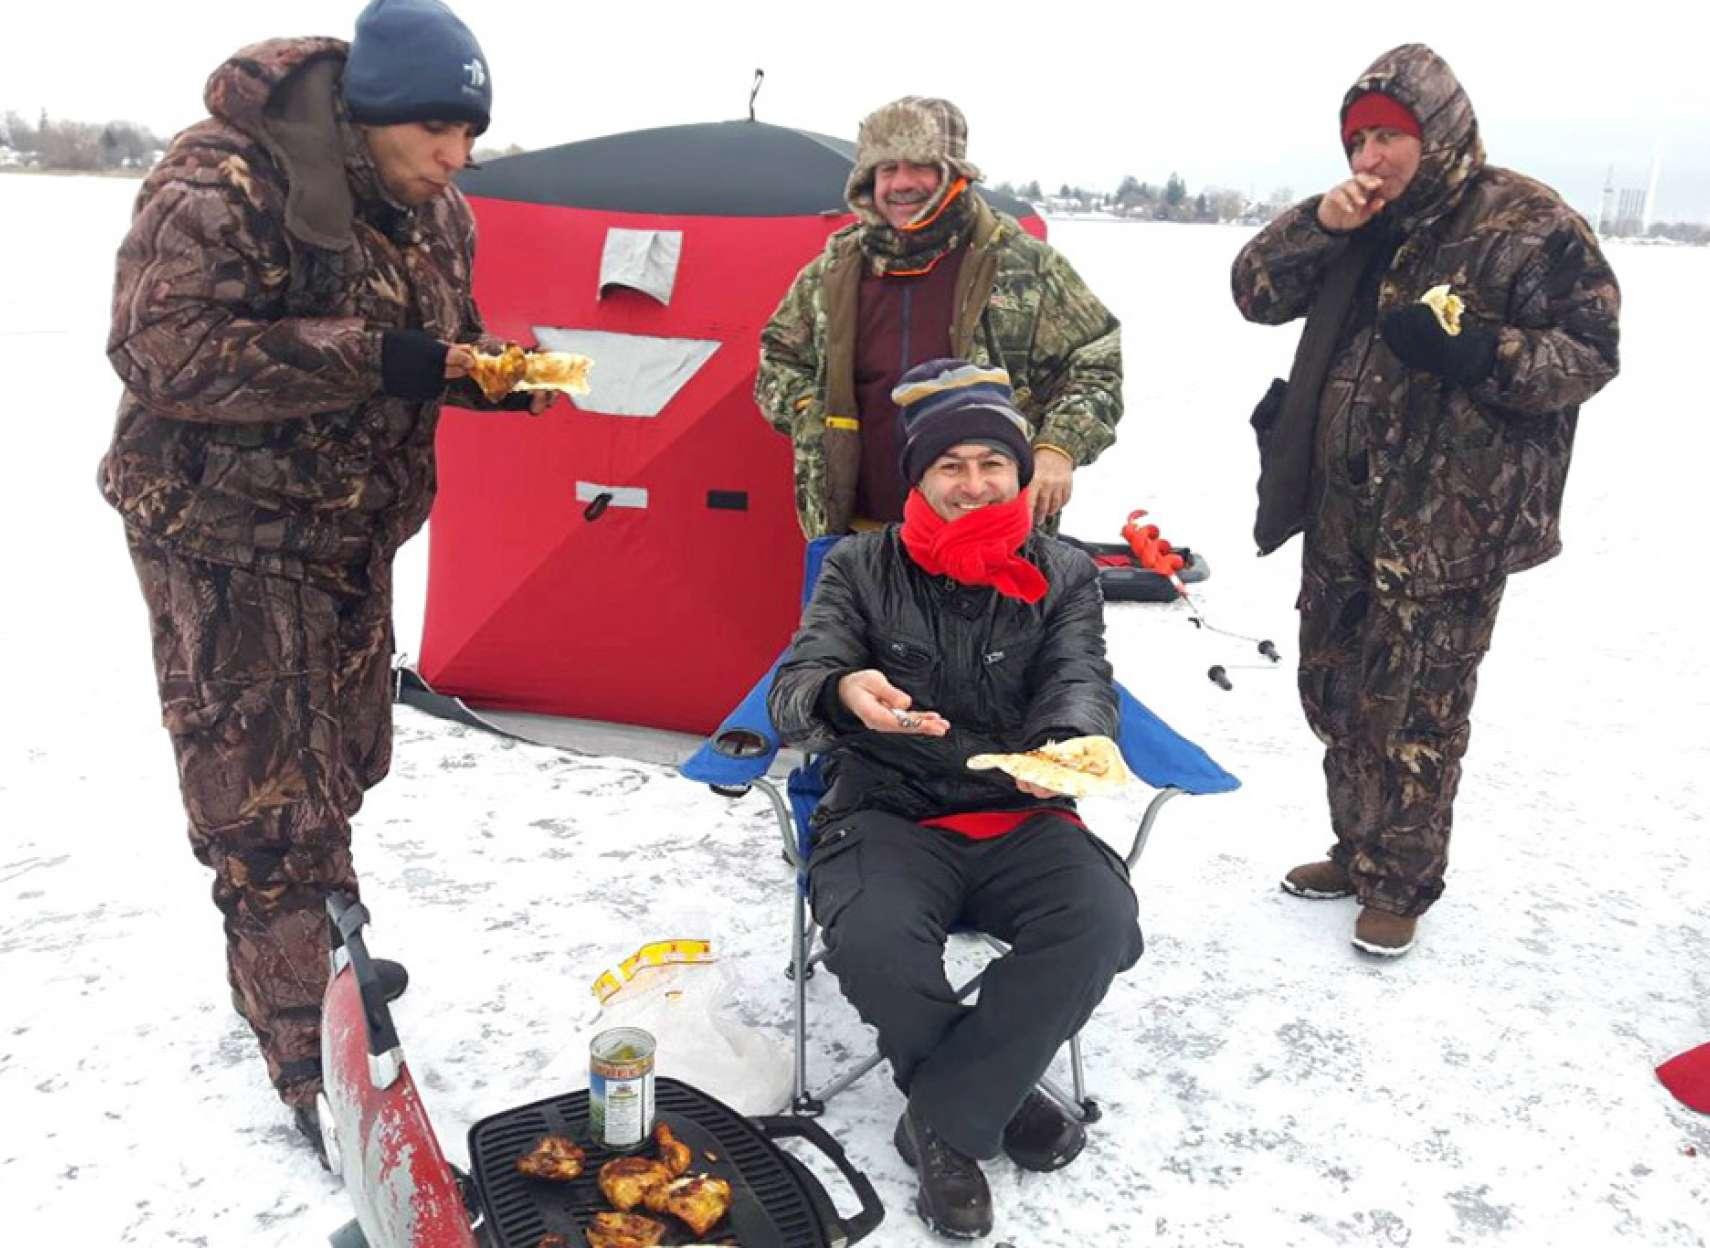 cultire-community-ice-fishing